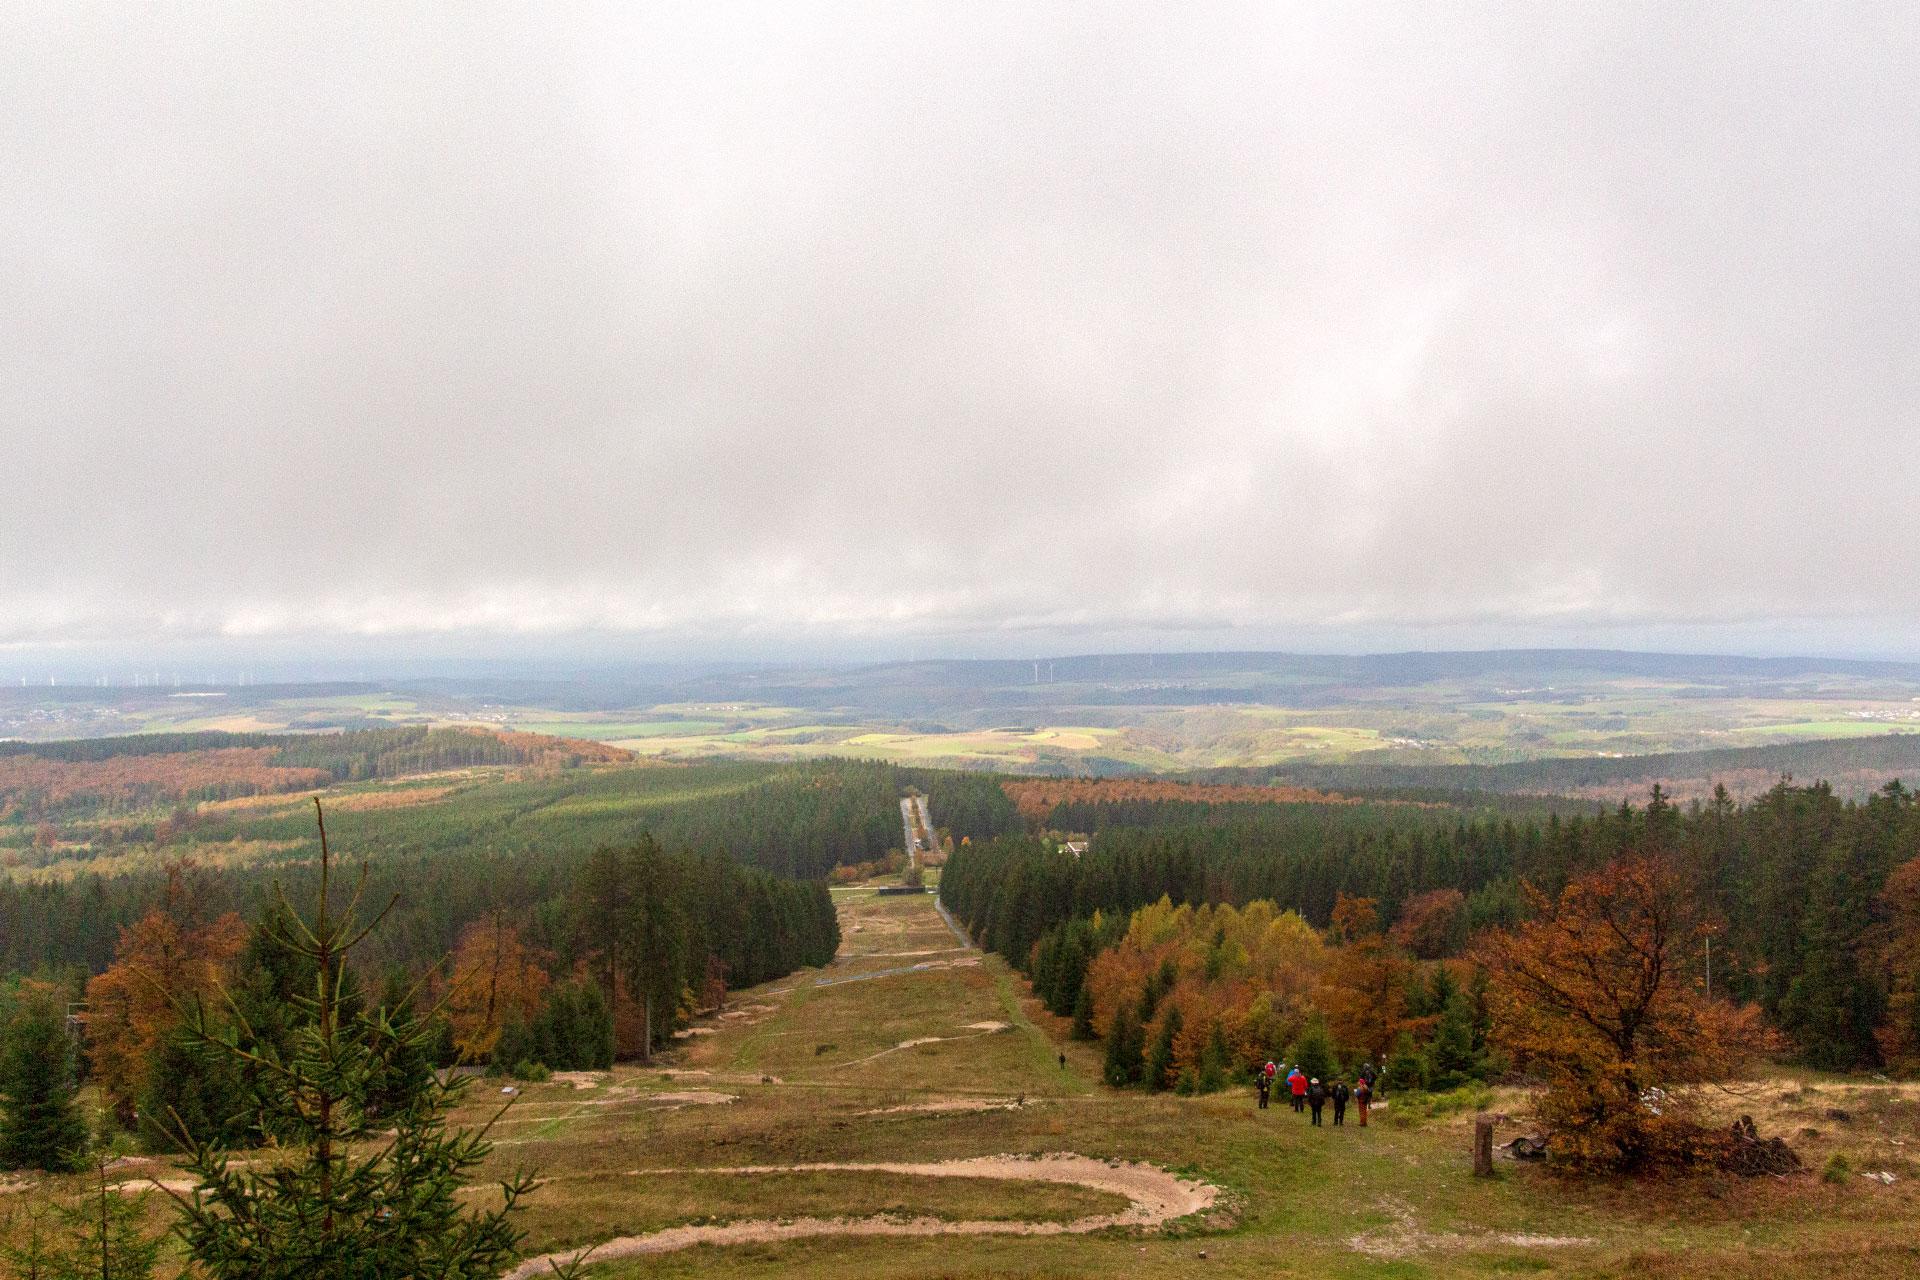 Höchster Berg der 10. Etappe vom Saar-Hunsrück-Steig: Erbeskopf (816m)